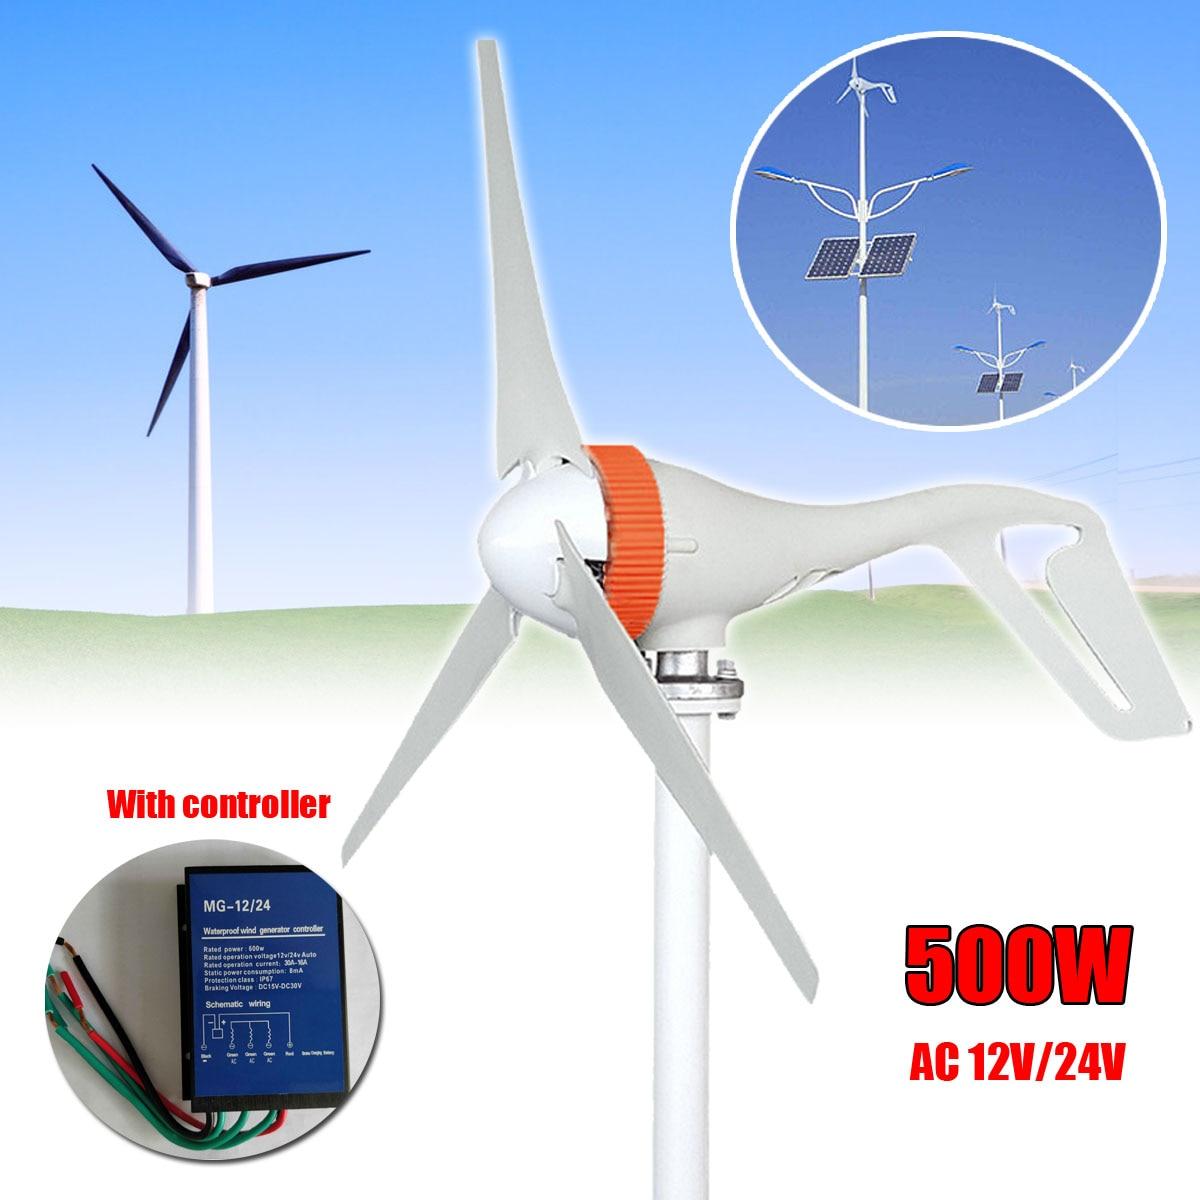 Hot 2018 Power 600w 5 Blades Wind Generator Turbine 24 Volt Wiring Diagram Ac 12v 24v 500w Mini Turbines Miniature With Controller 3